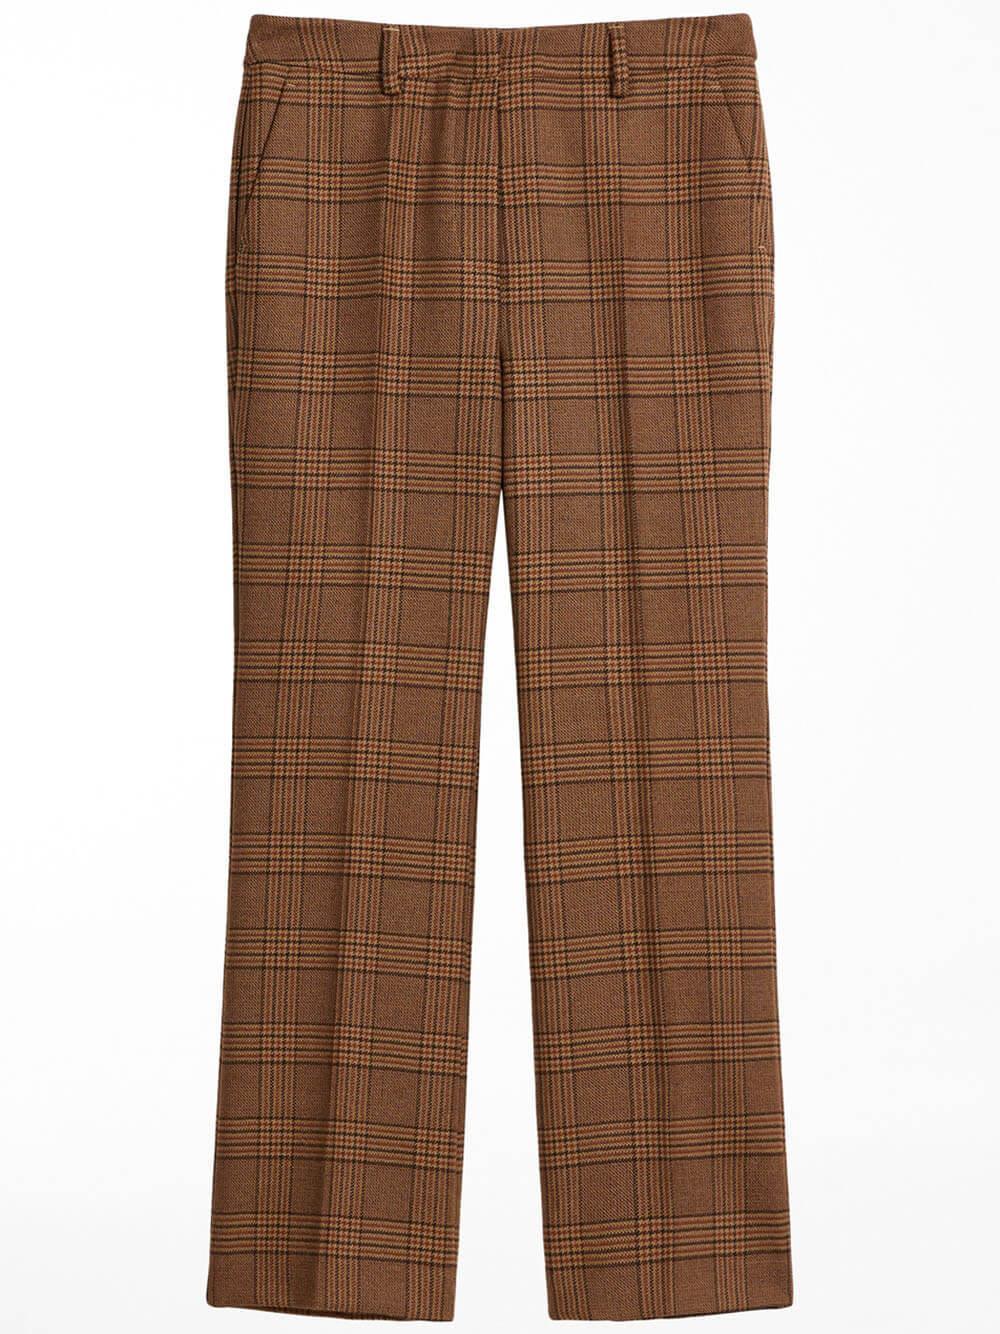 Gel Plaid Trouser Item # 5136071306